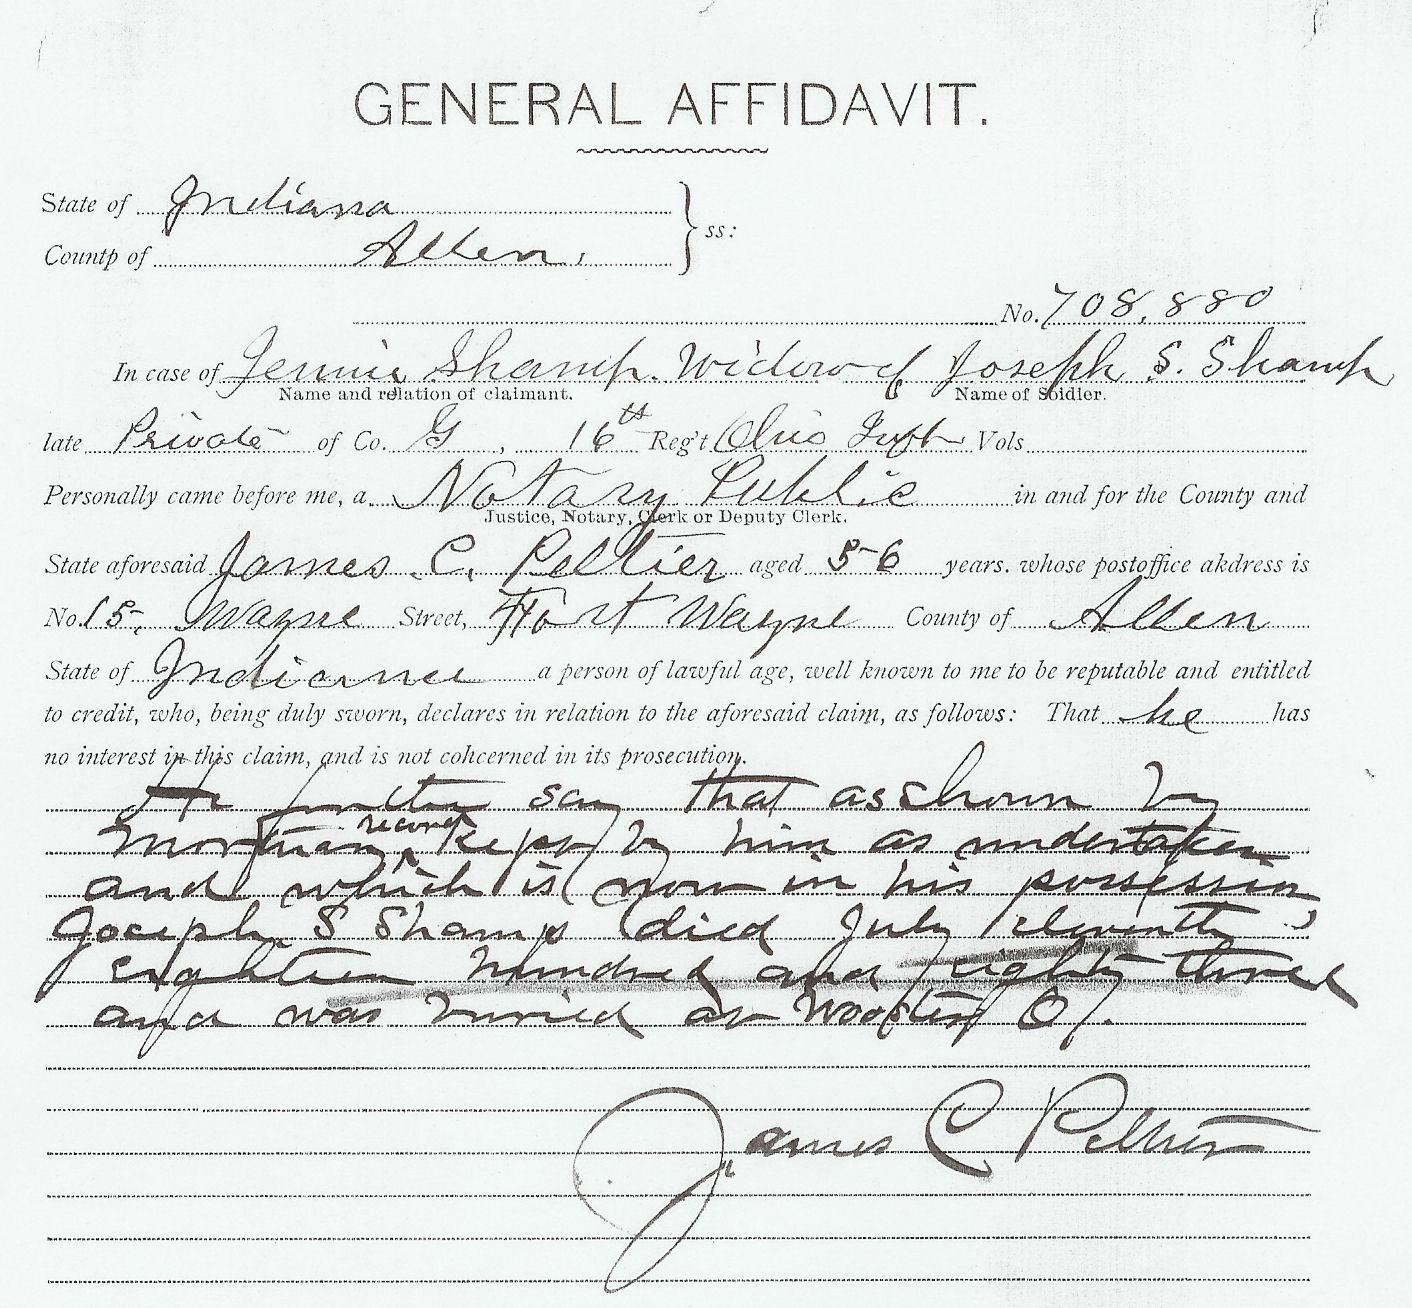 General Affidavit | Clipart Panda - Free Clipart Images